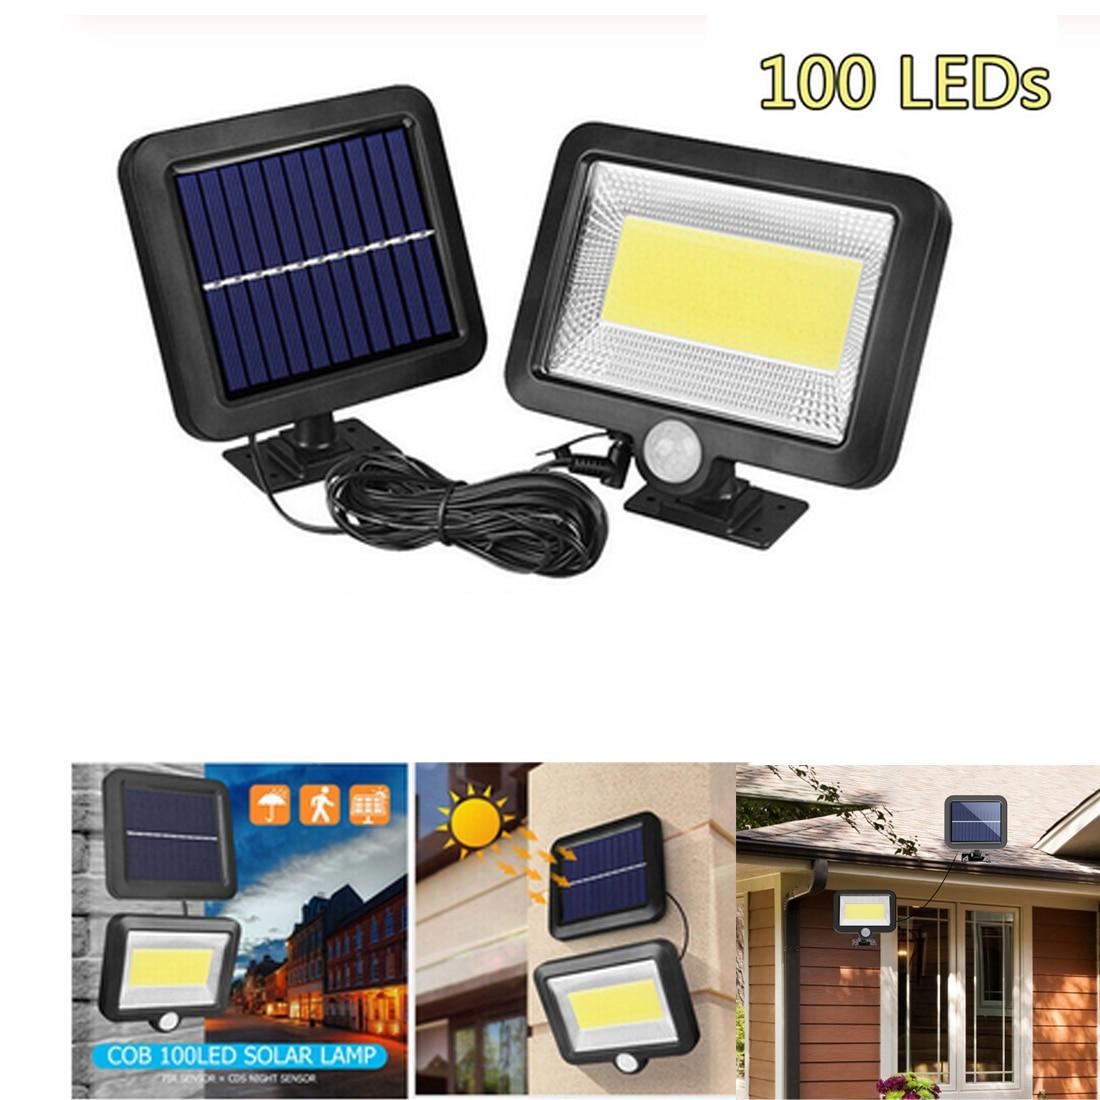 Cob 56 100led Solar Lamp Motion Sensor Outdoor Path Support Outdoor Lighting Solar Light Sunlight Leather Bag